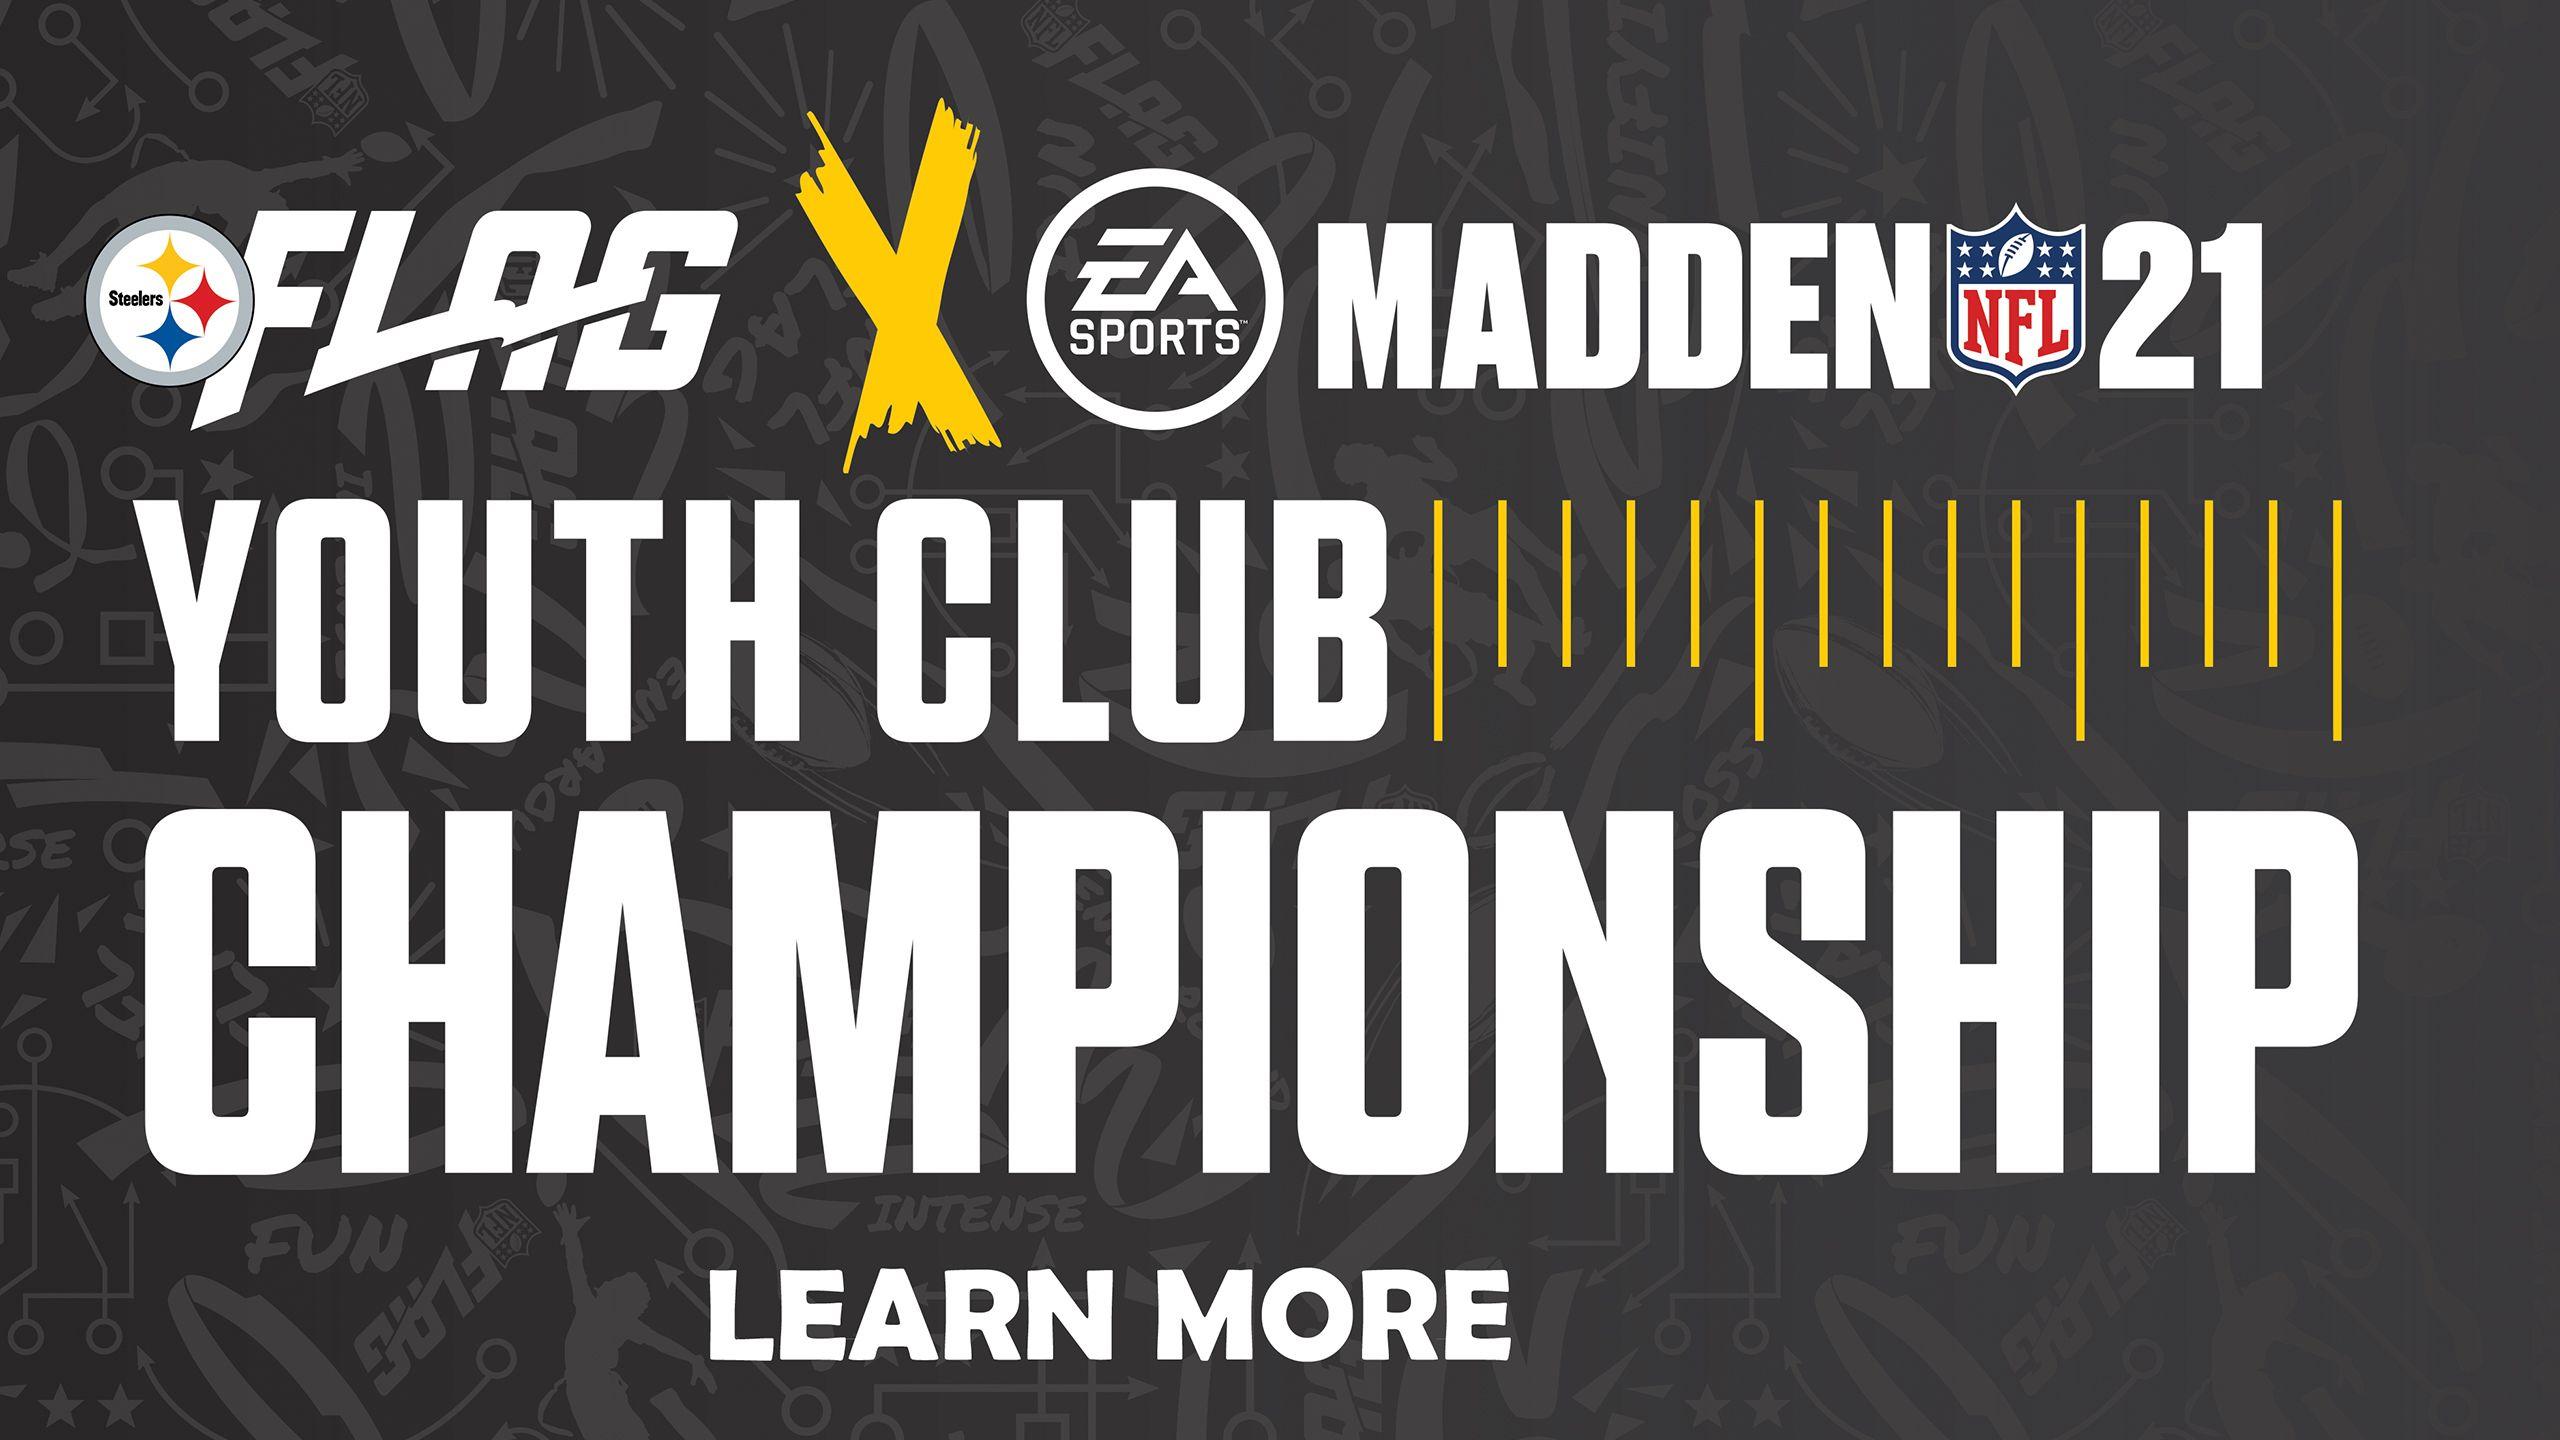 NFL FLAG Madden 21 Youth Club Championship